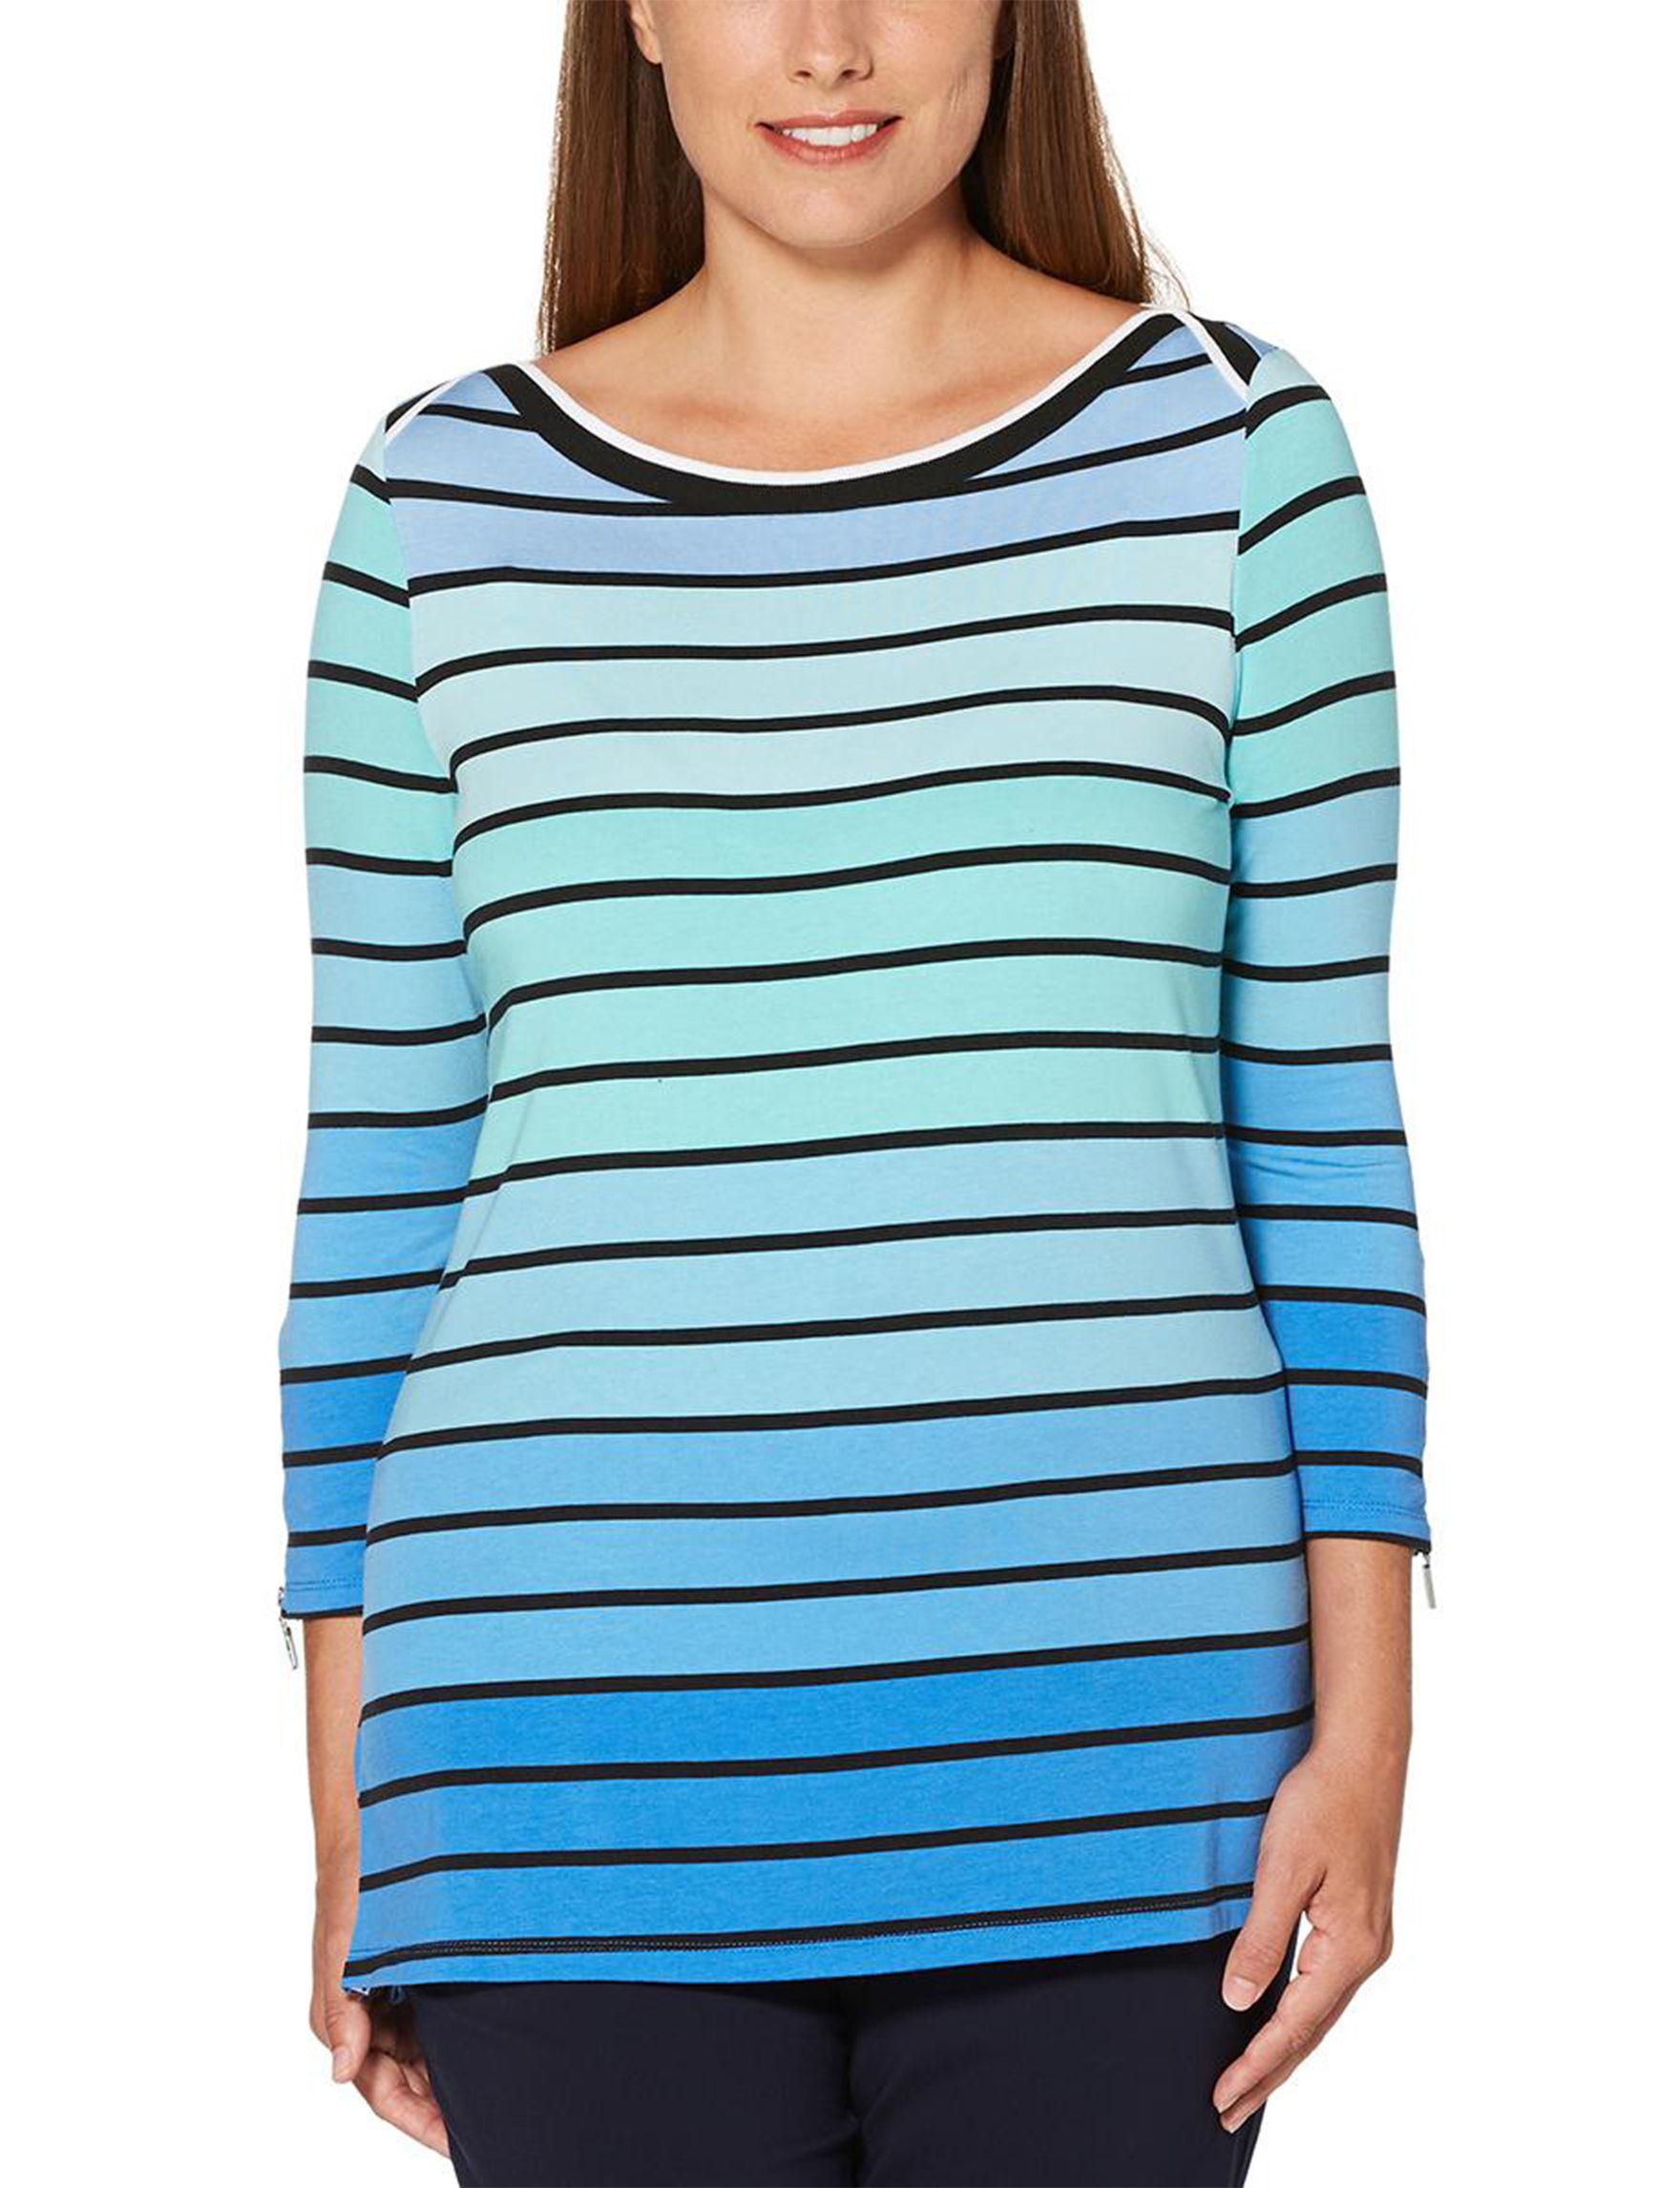 Rafaella Turquoise Shirts & Blouses Tunics